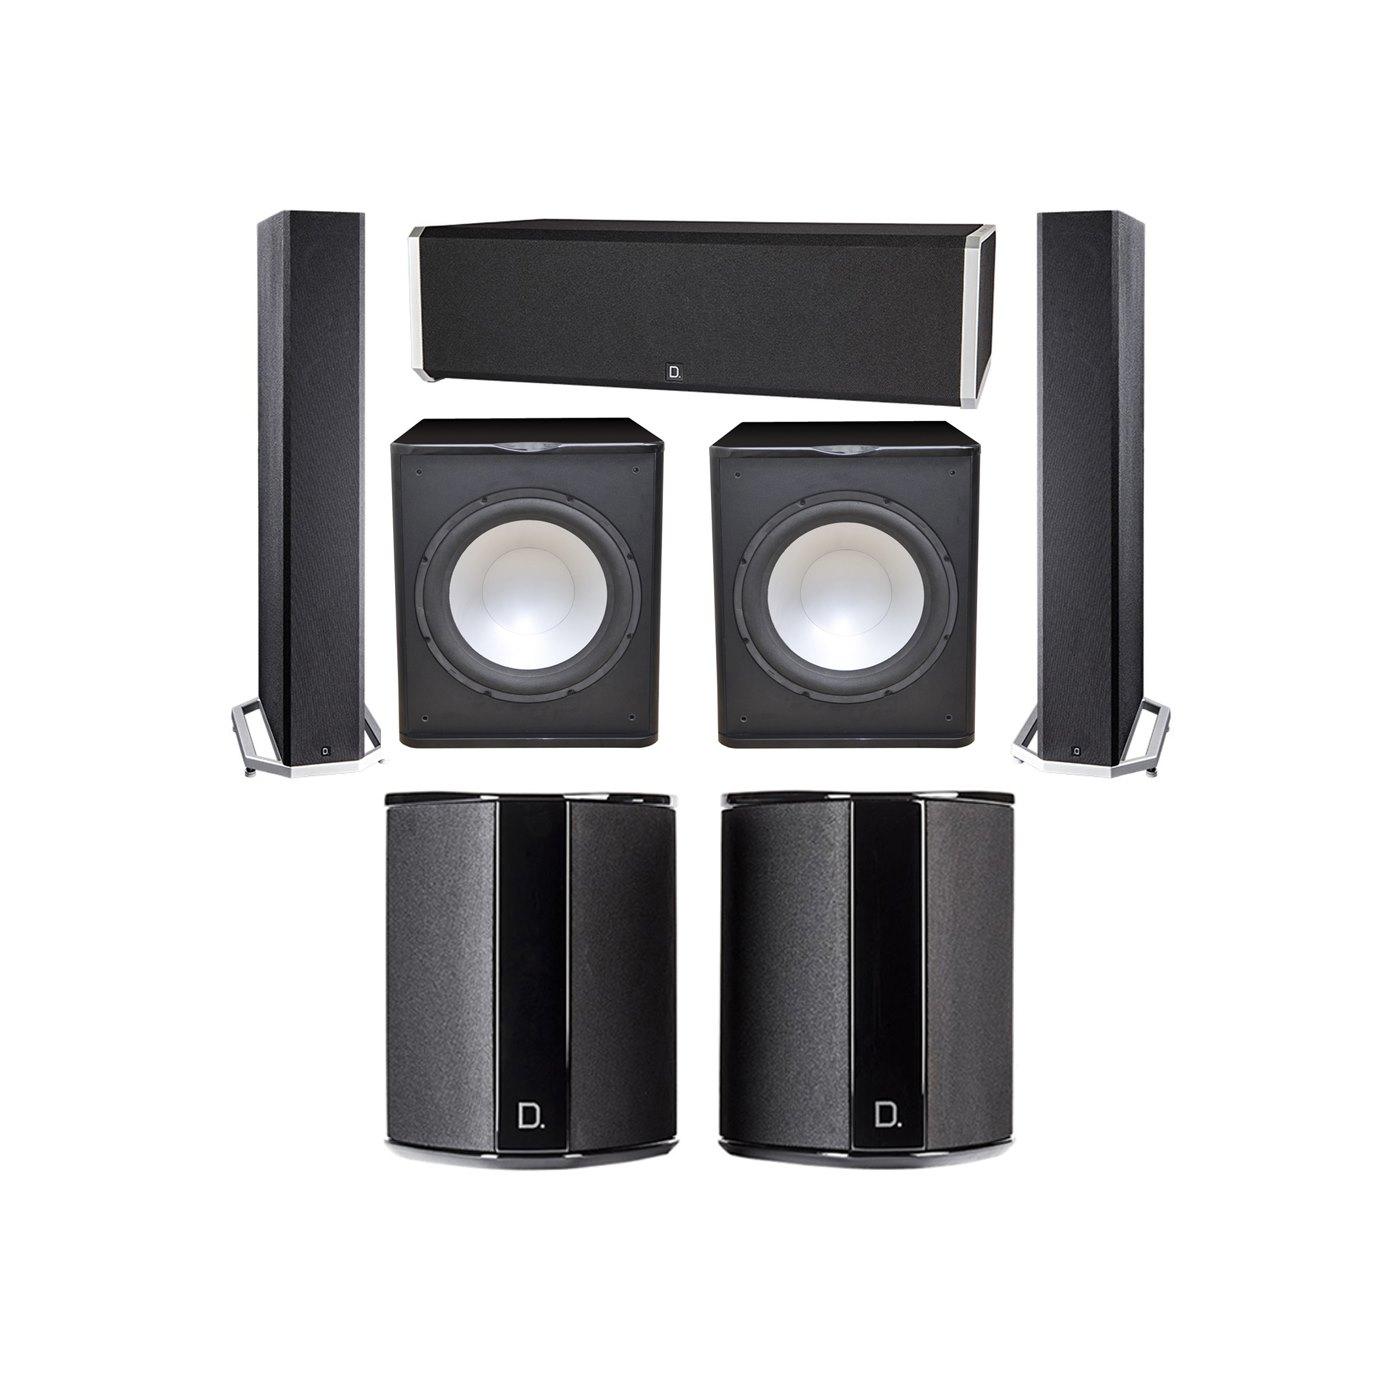 Definitive Technology 5.2 System with 2 BP9040 Tower Speakers, 1 CS9040 Center Channel Speaker, 2 SR9040 Surround Speaker, 2 Premier Acoustic PA-150 Subwoofer